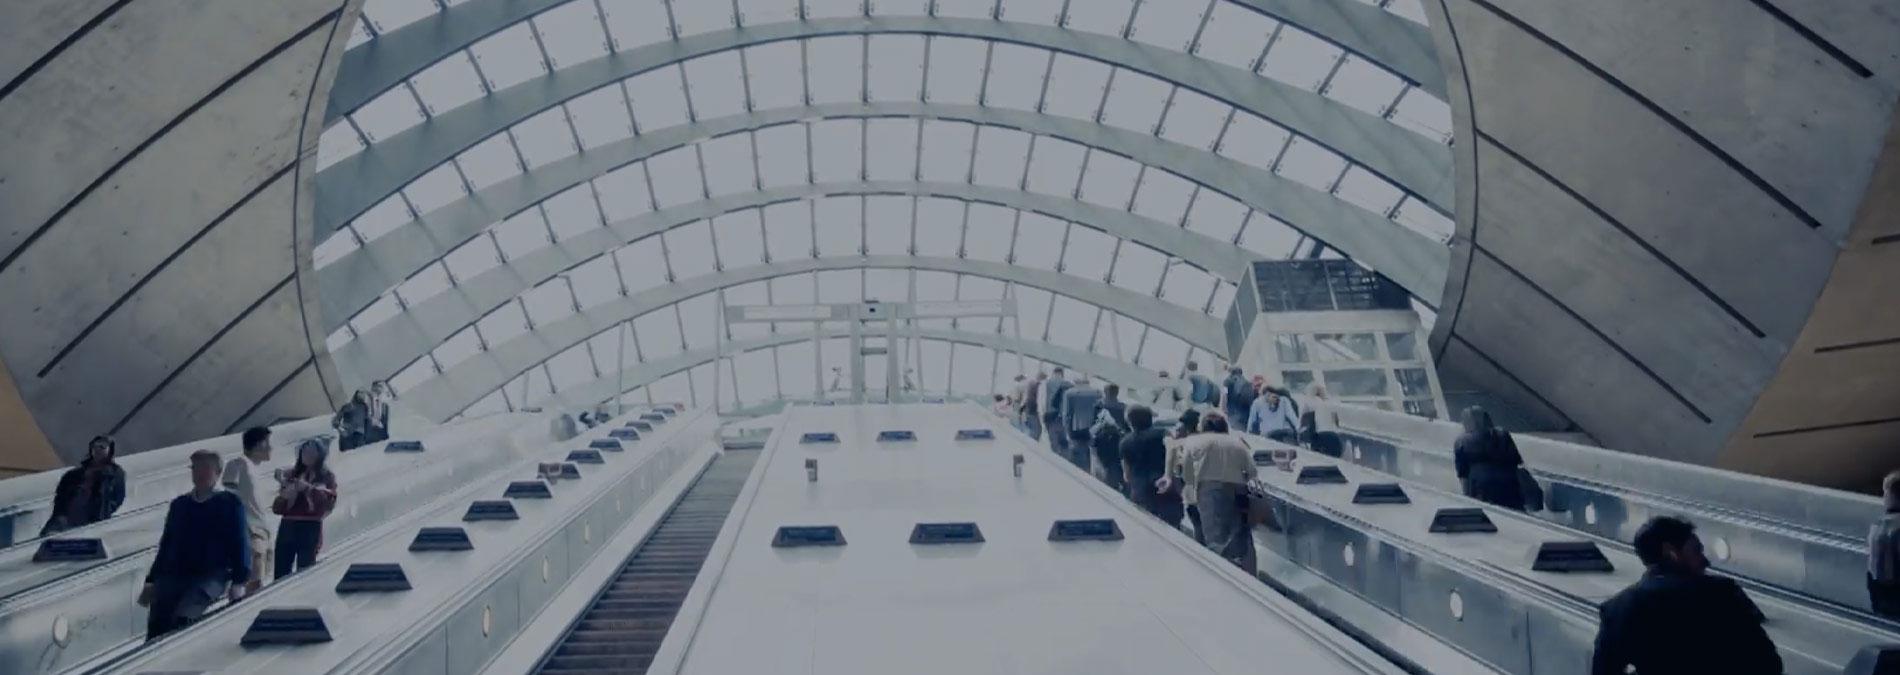 Otis_escalators_ourcompany_header2